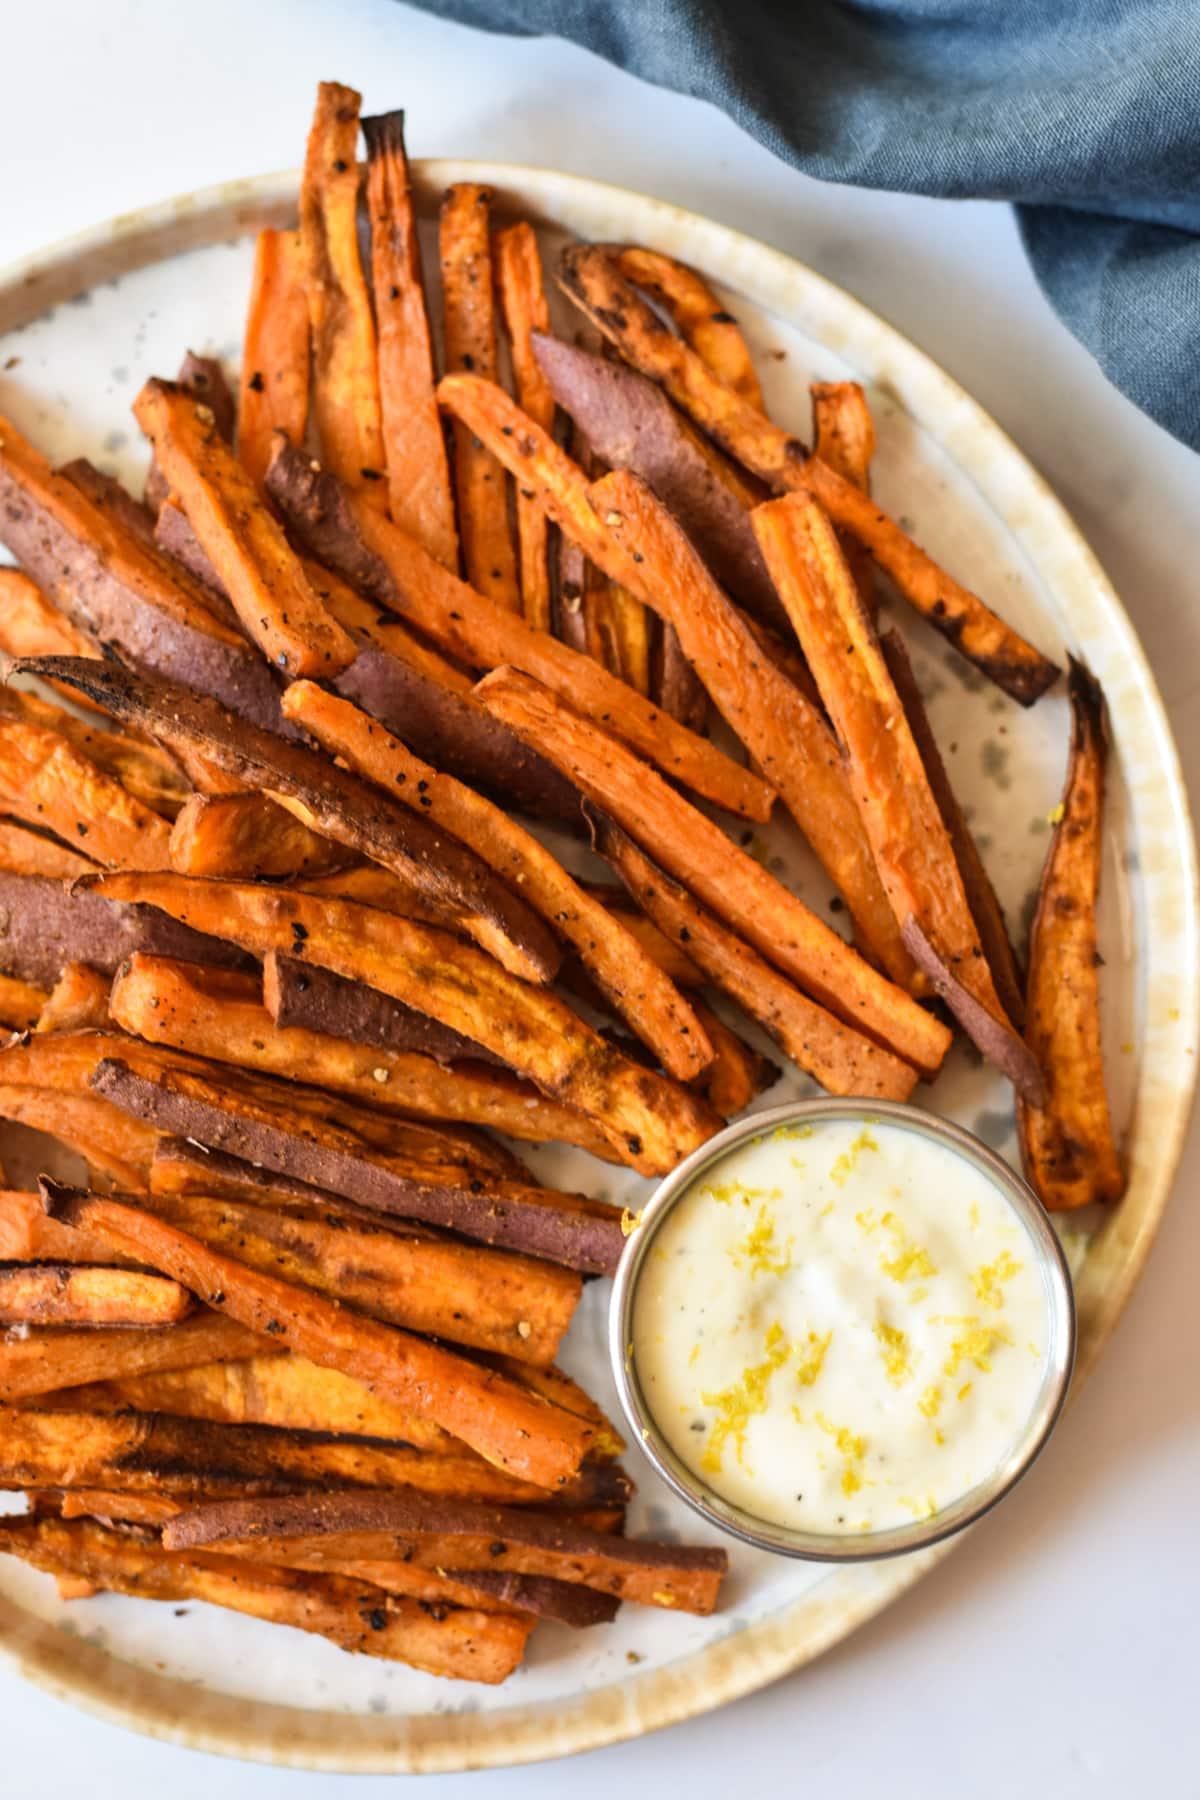 plate of sweet potato fries with aioli sauce